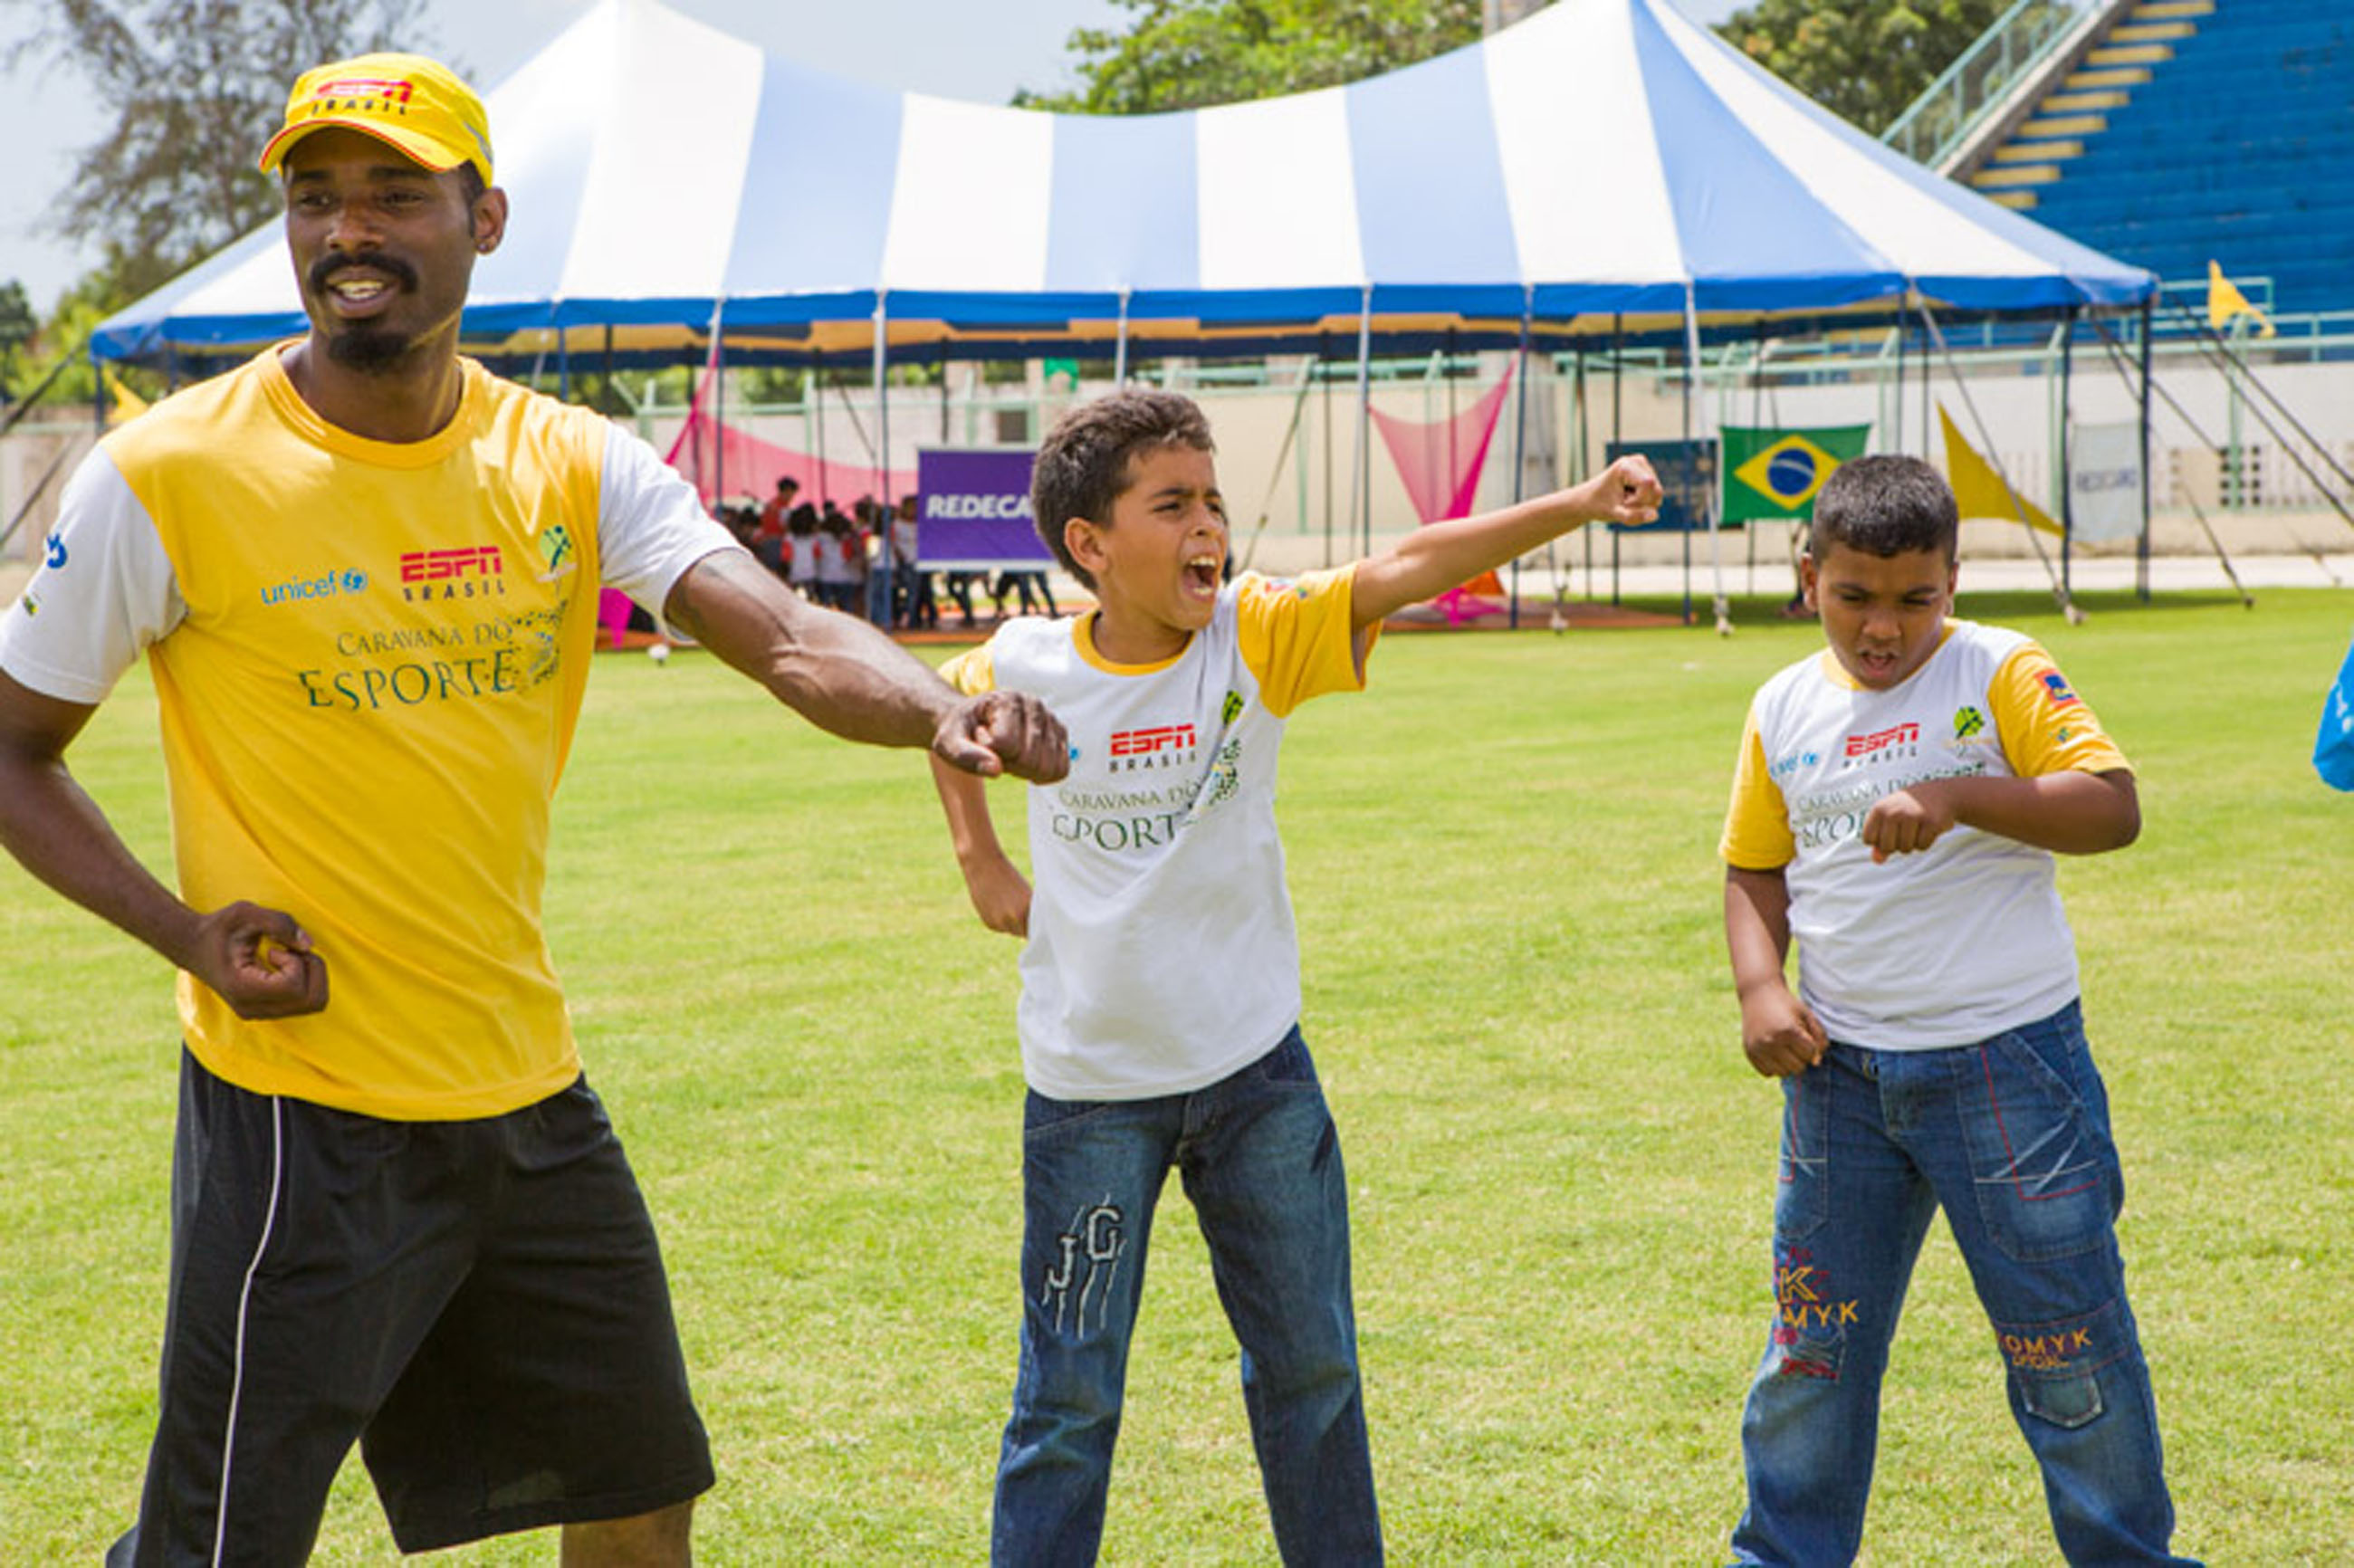 Feira de Santana recebe a próxima etapa da Caravana do Esporte e Caravana das Artes